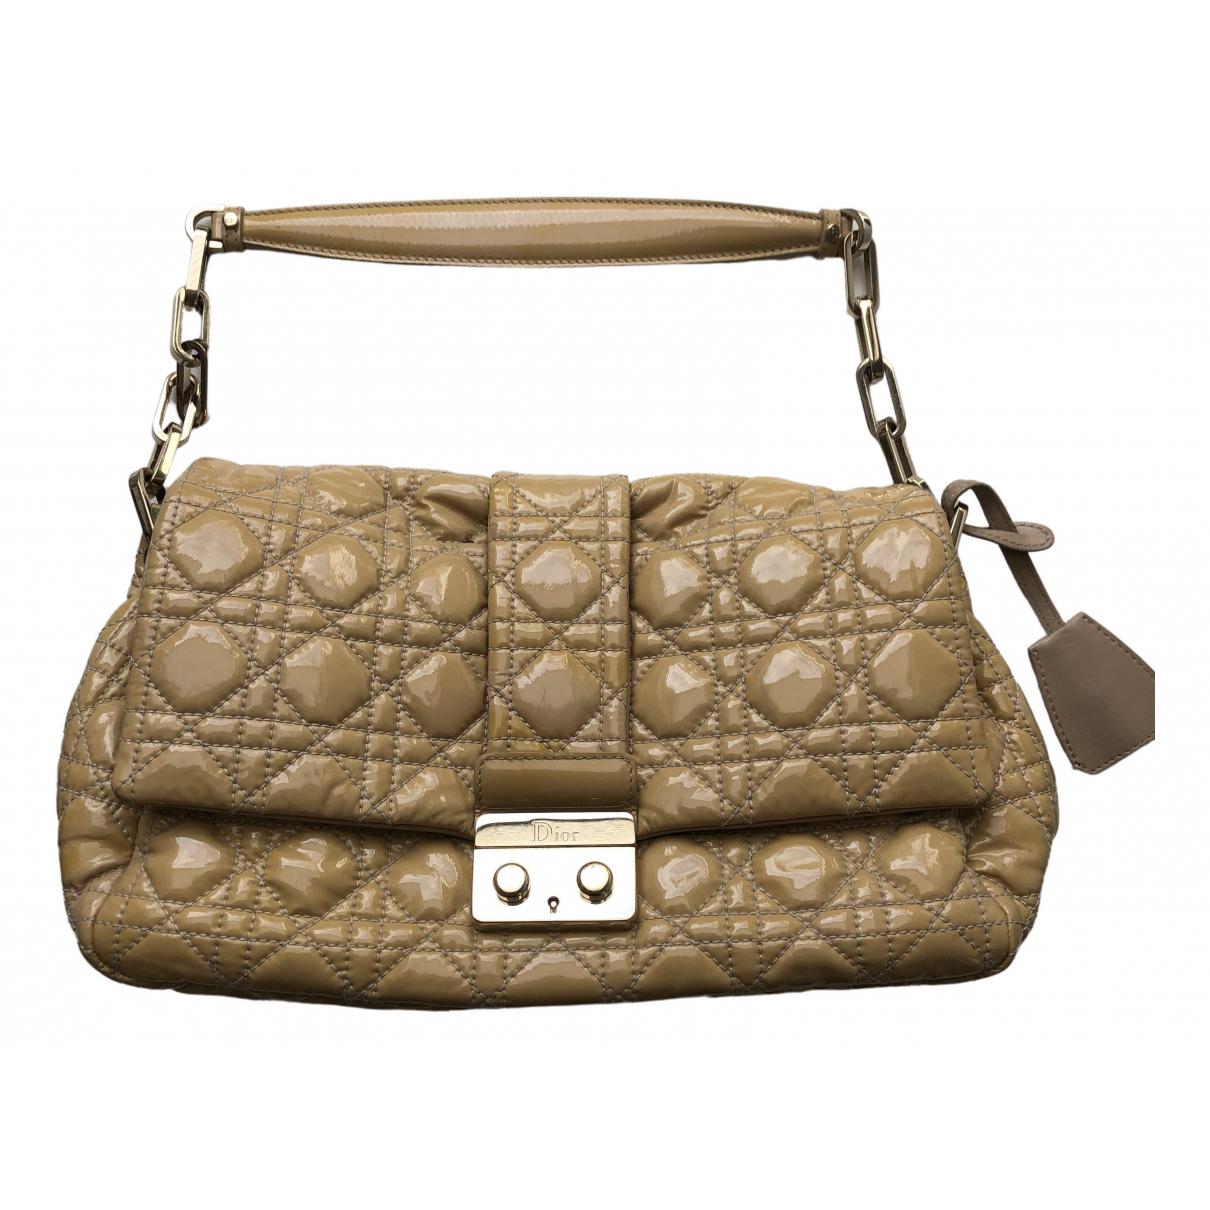 Dior New Lock  Beige Patent leather handbag for Women \N